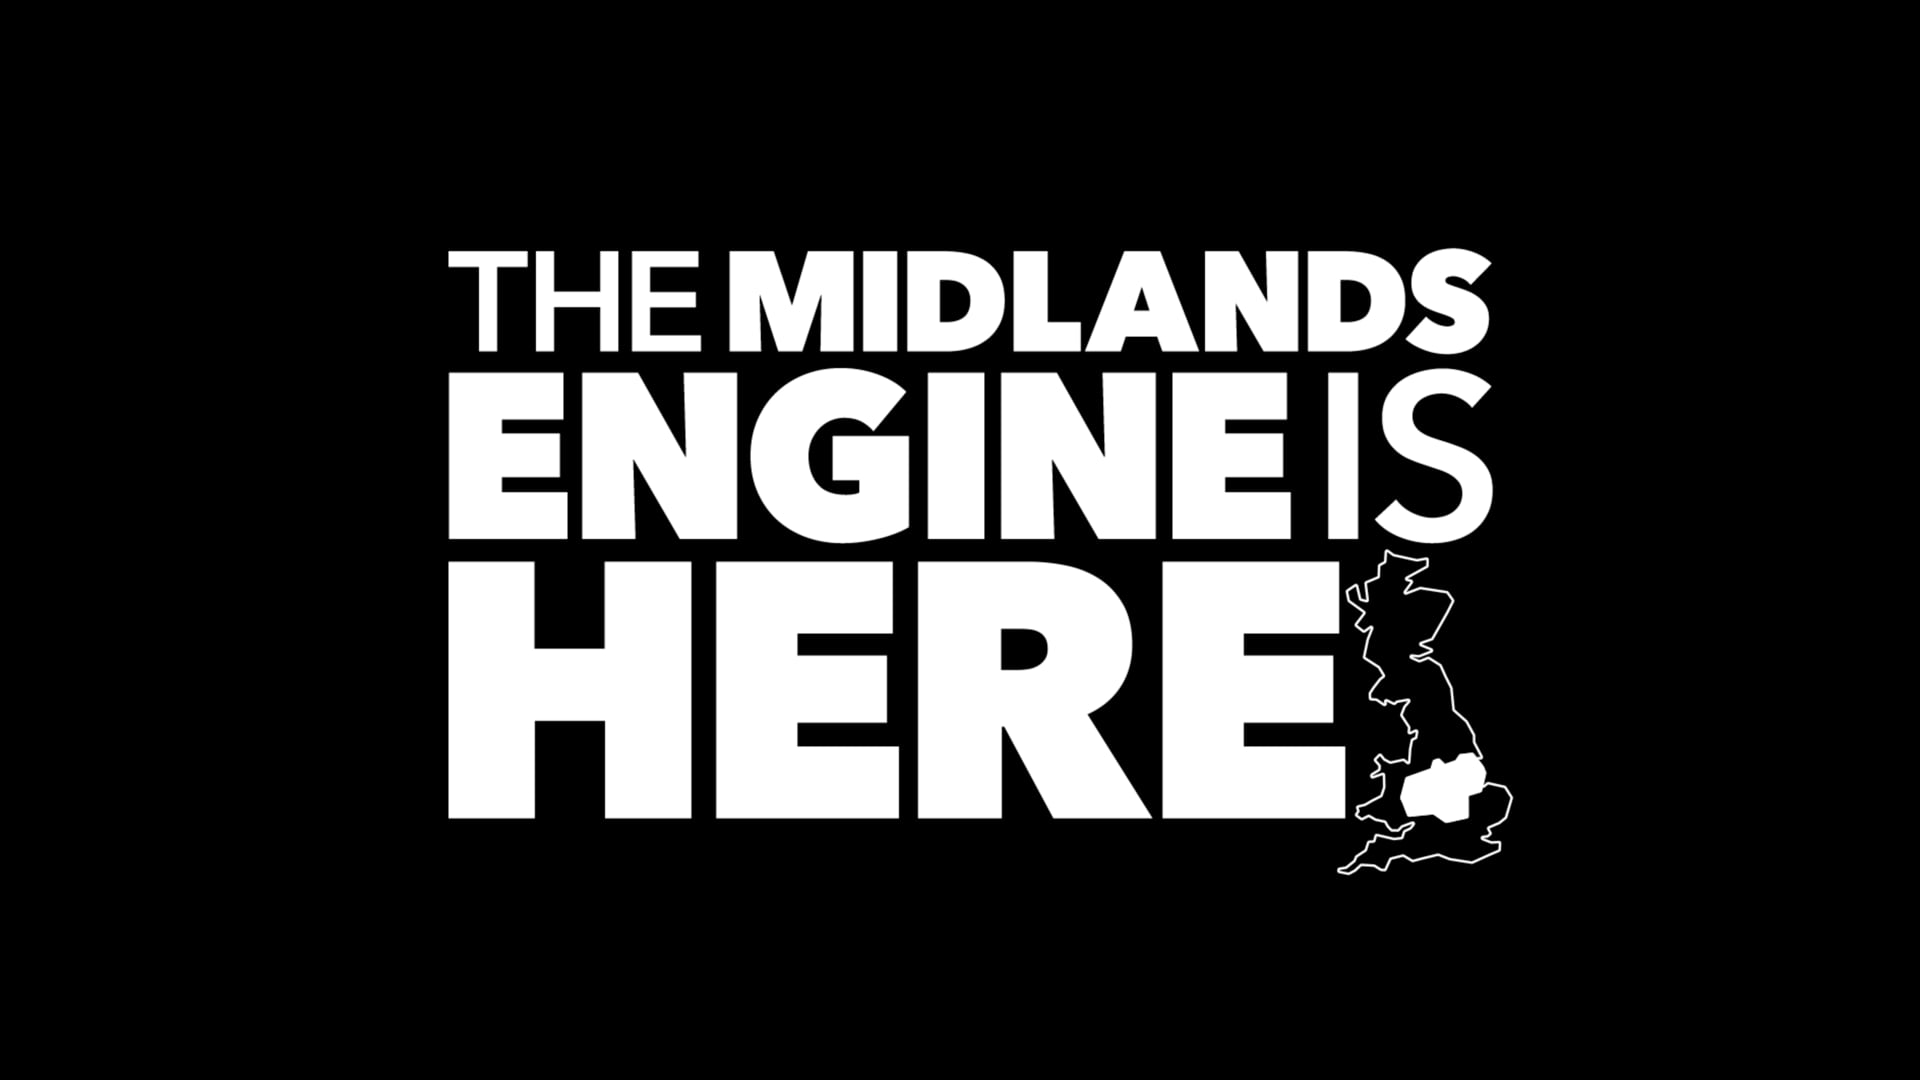 Midlands Engine - Commercial